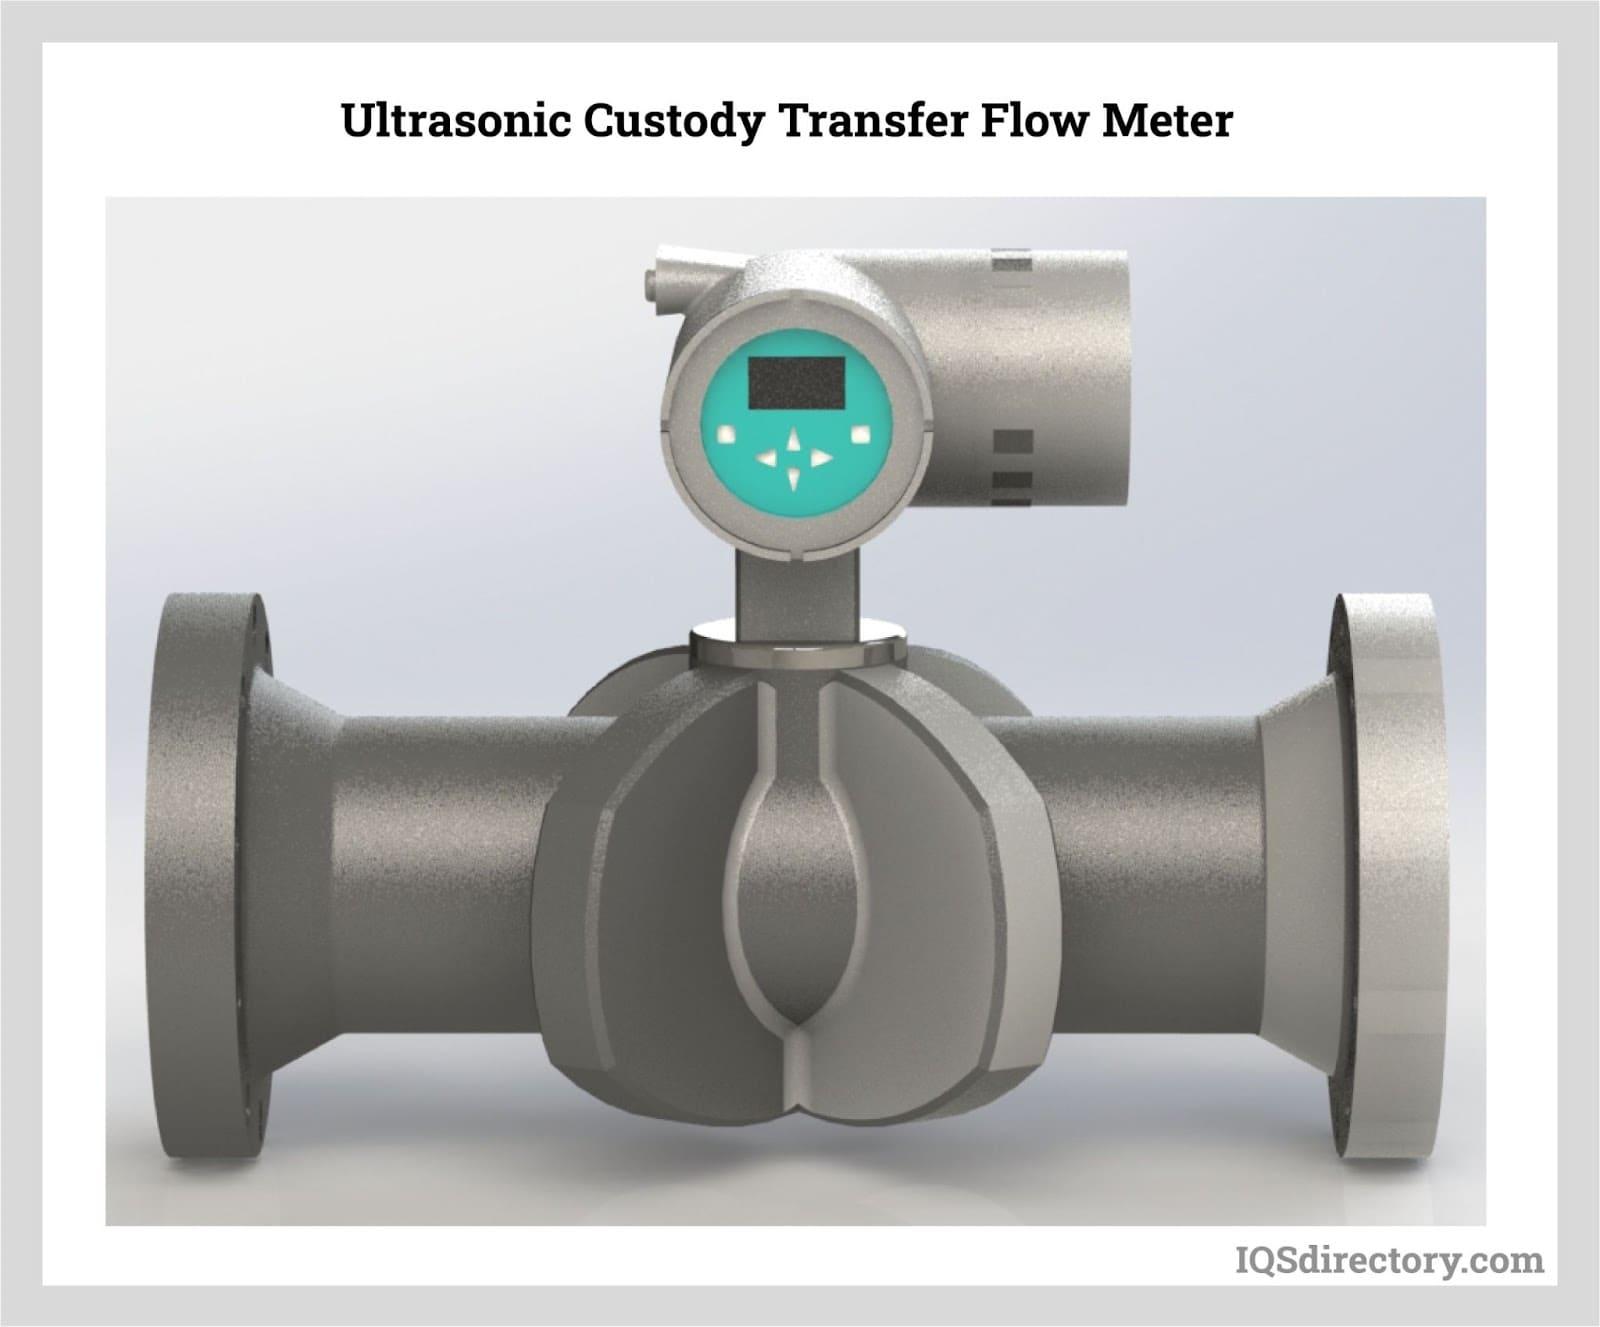 Ultrasonic Custody Transfer Flow Meter